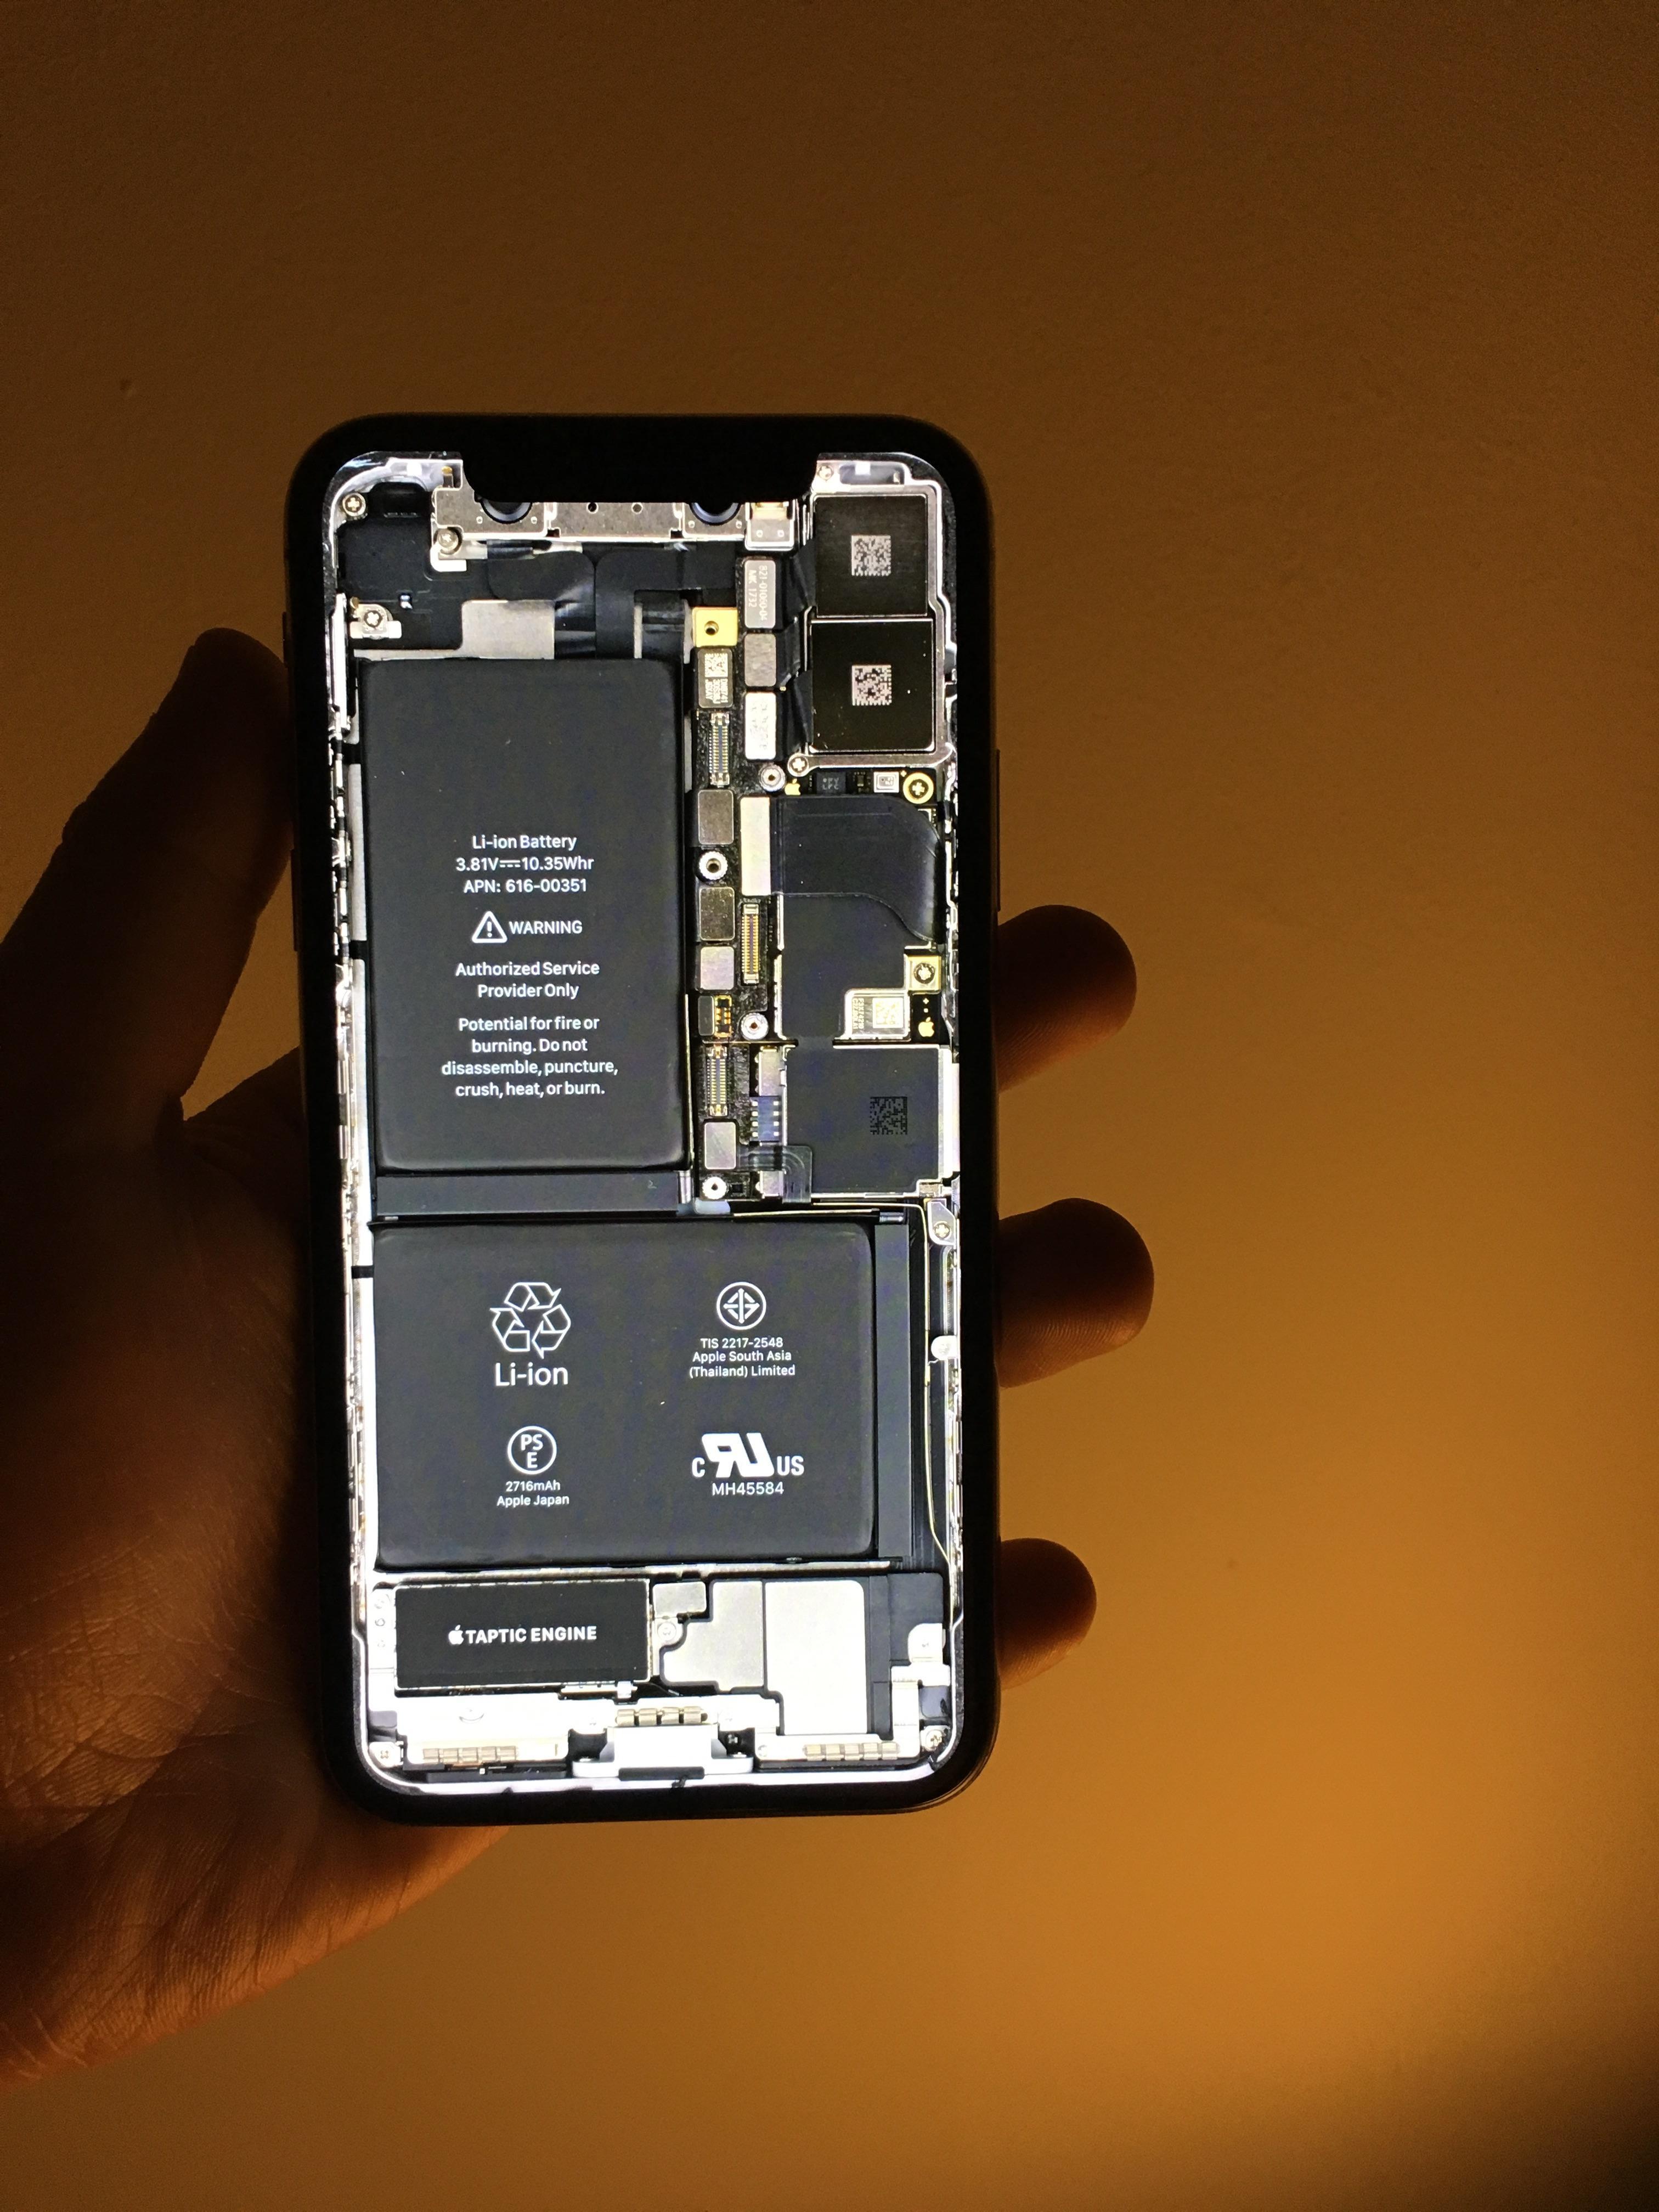 Iphone 7 Plus Internals - HD Wallpaper